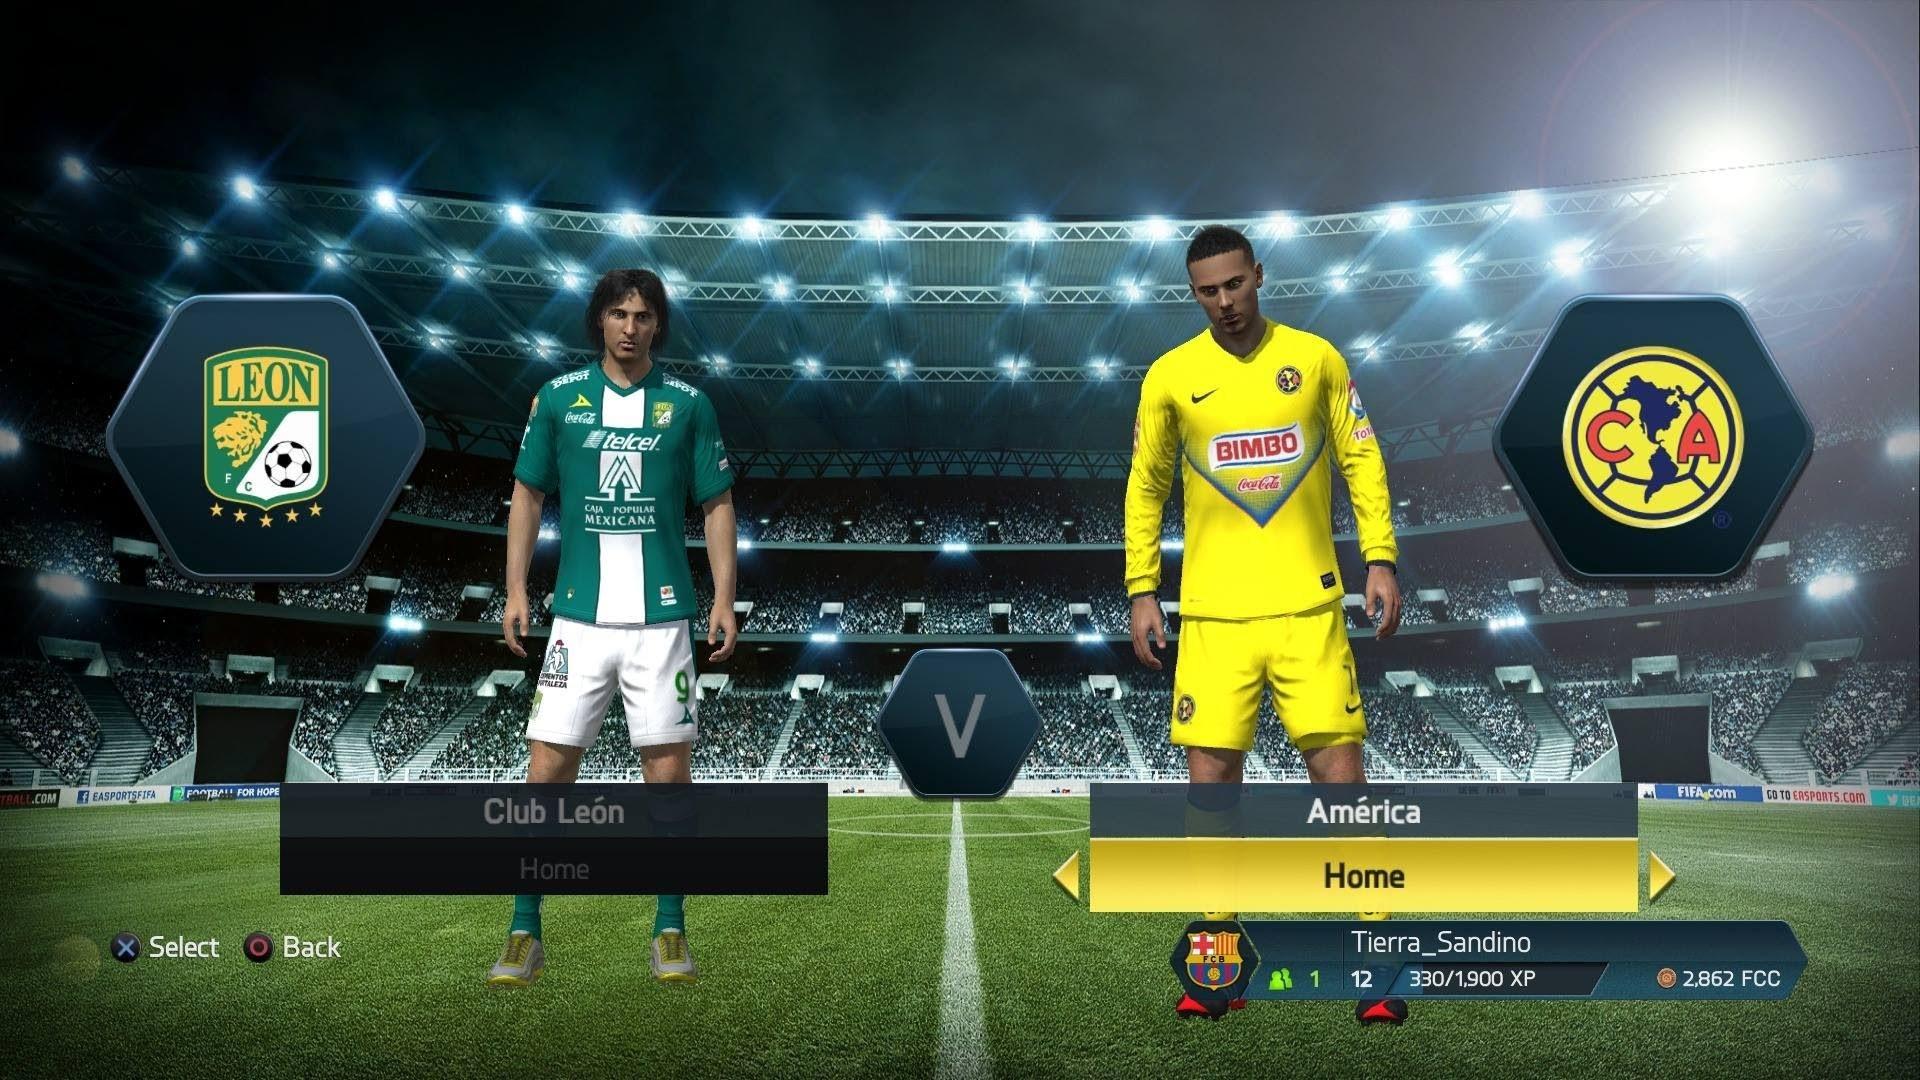 PS4 FIFA 14 Modo Carrera Jugador Lucas Rayo EP9 America vs Club Leon